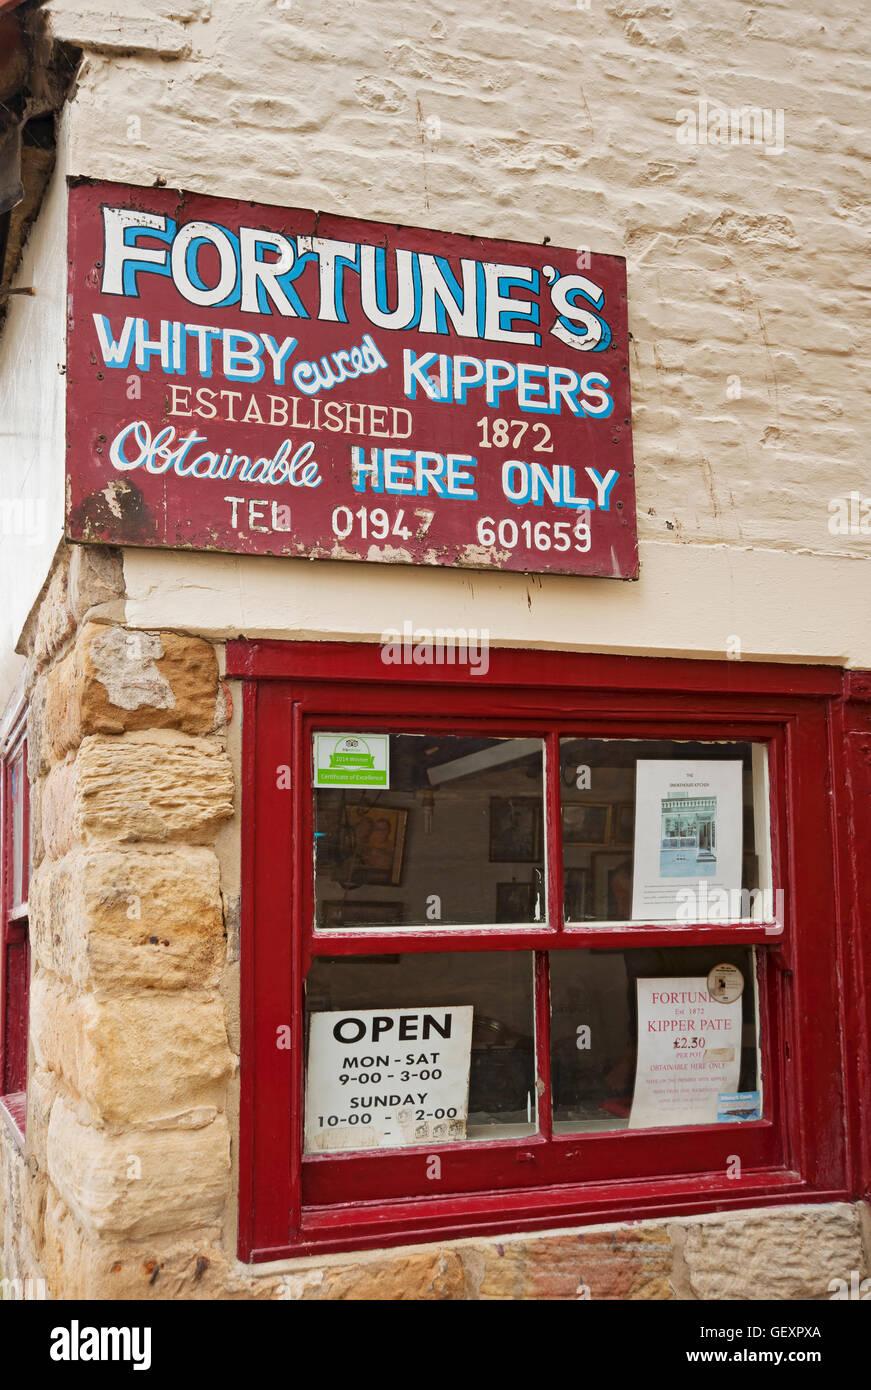 Fortune's kipper shop. - Stock Image